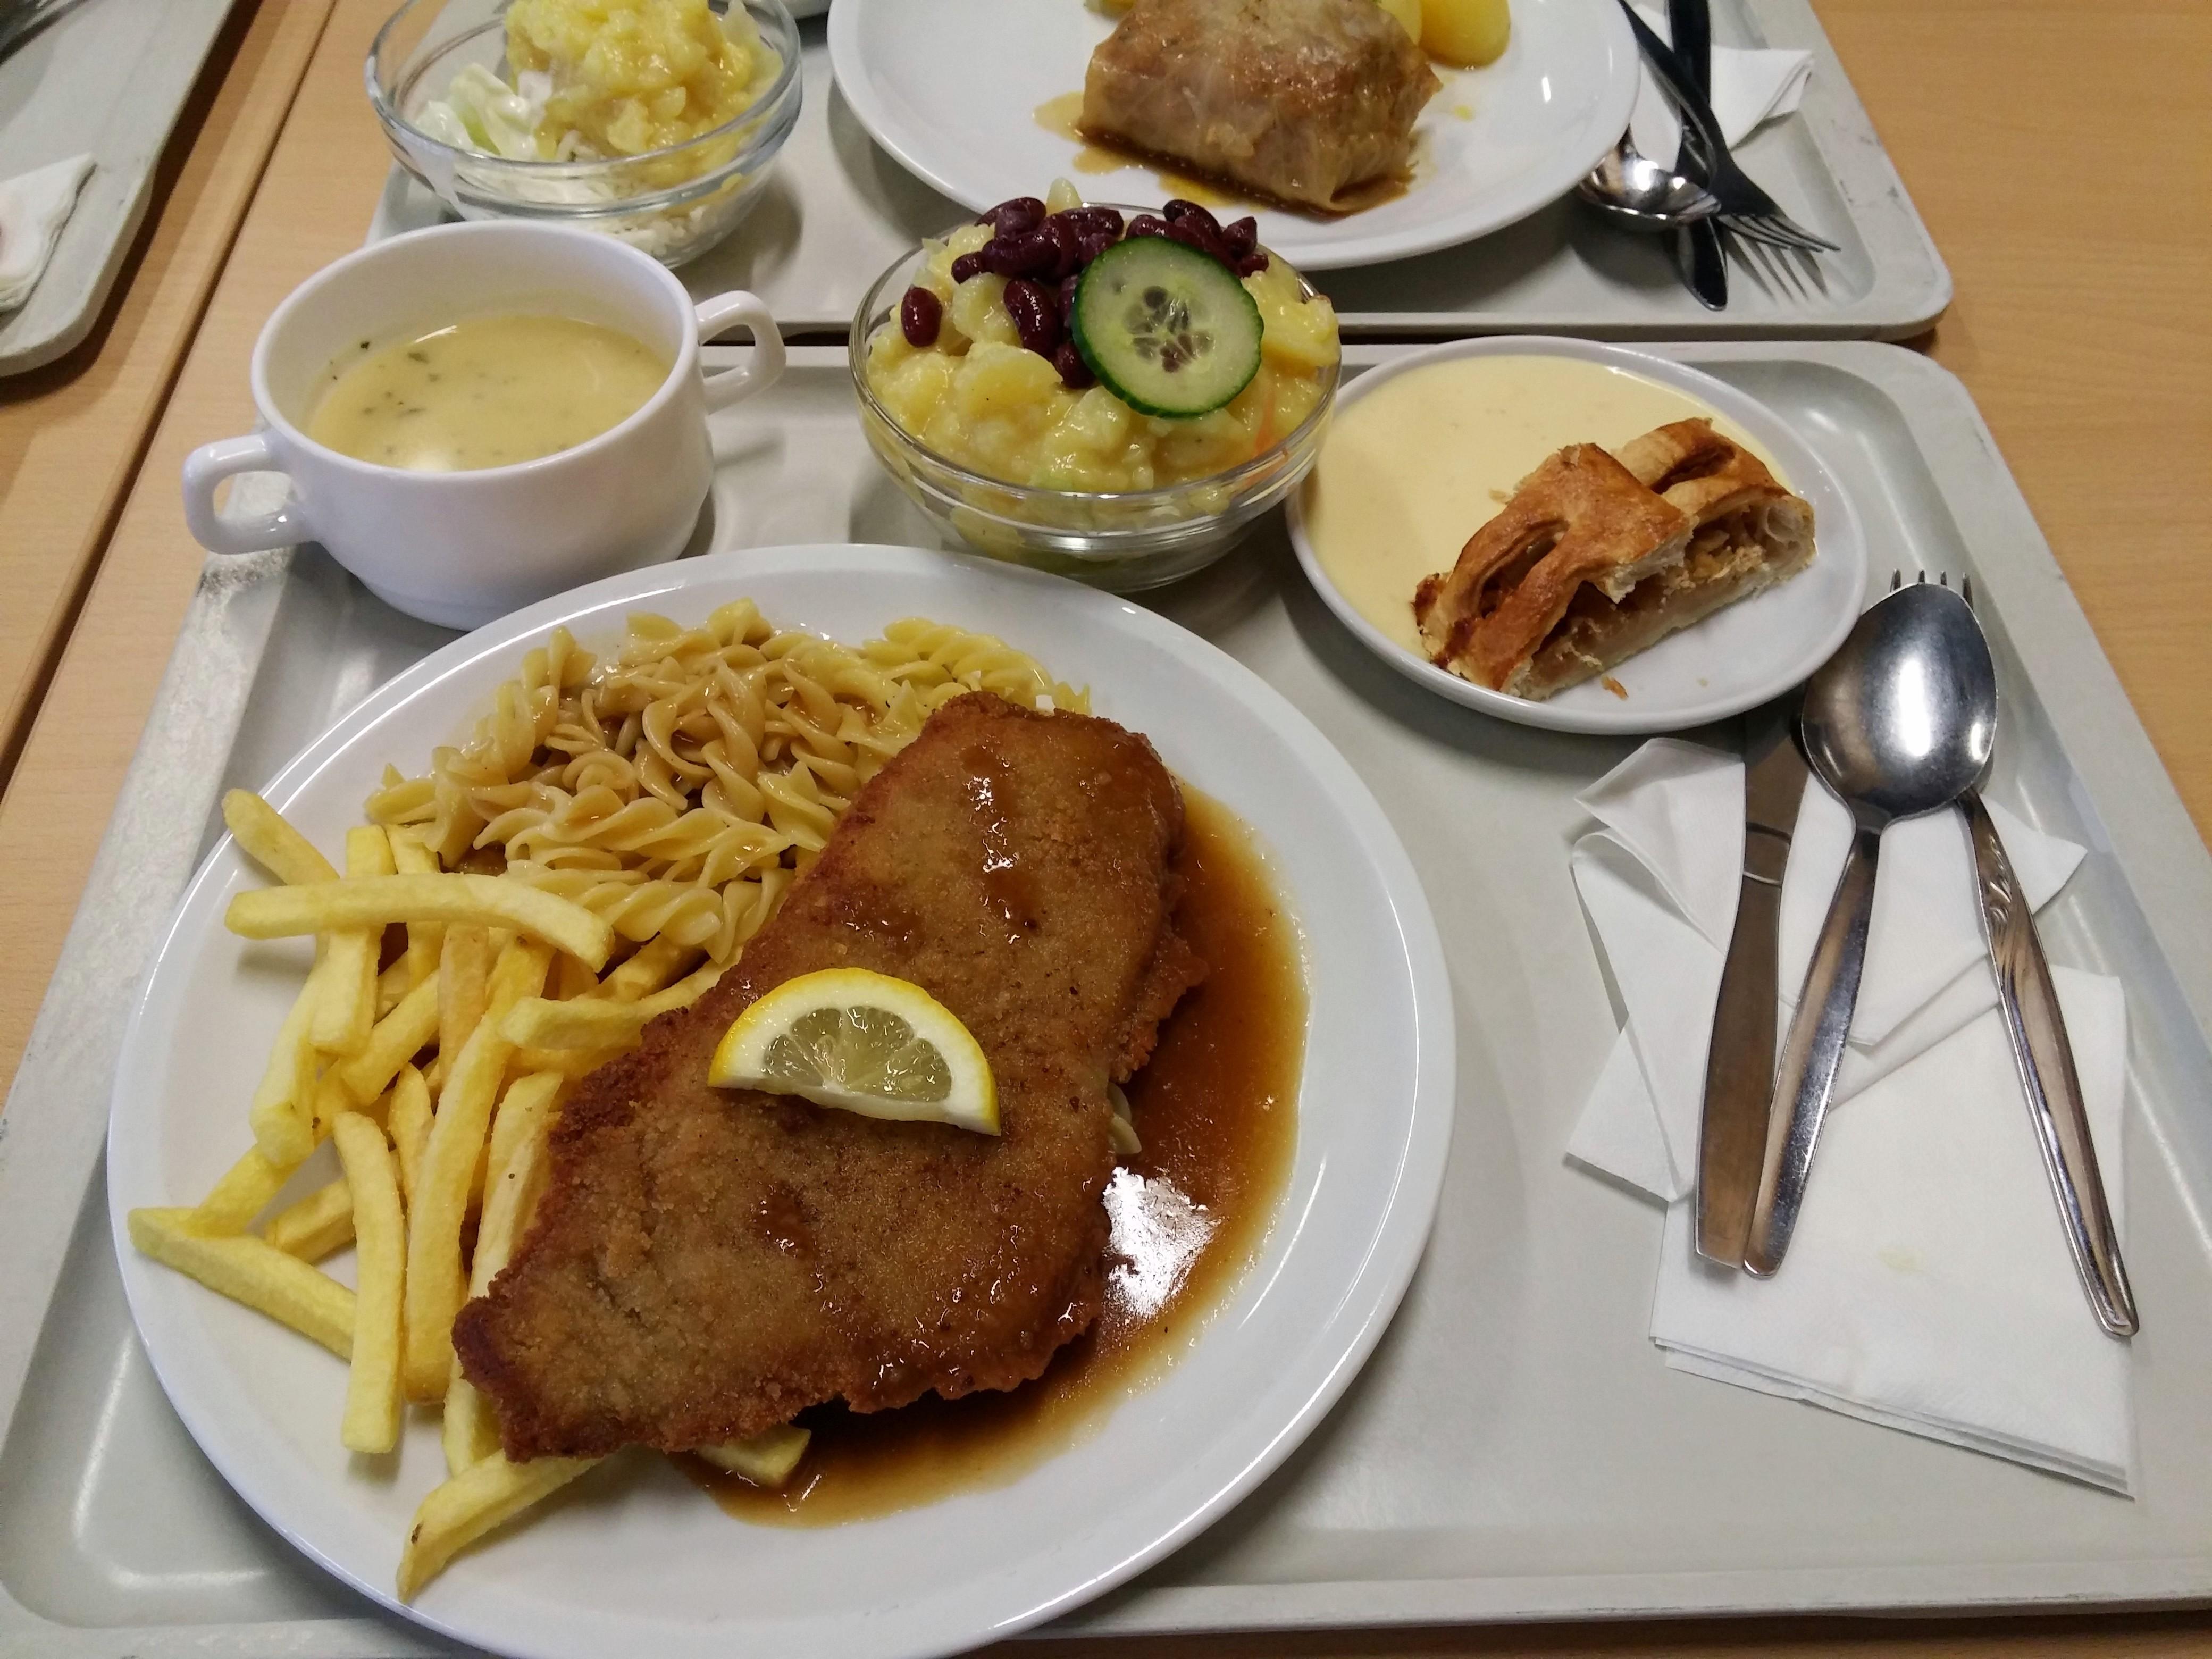 https://foodloader.net/nico_2015-01-22_schnitzel-pommes-nudeln-suppe-salat-nachtisch.jpg